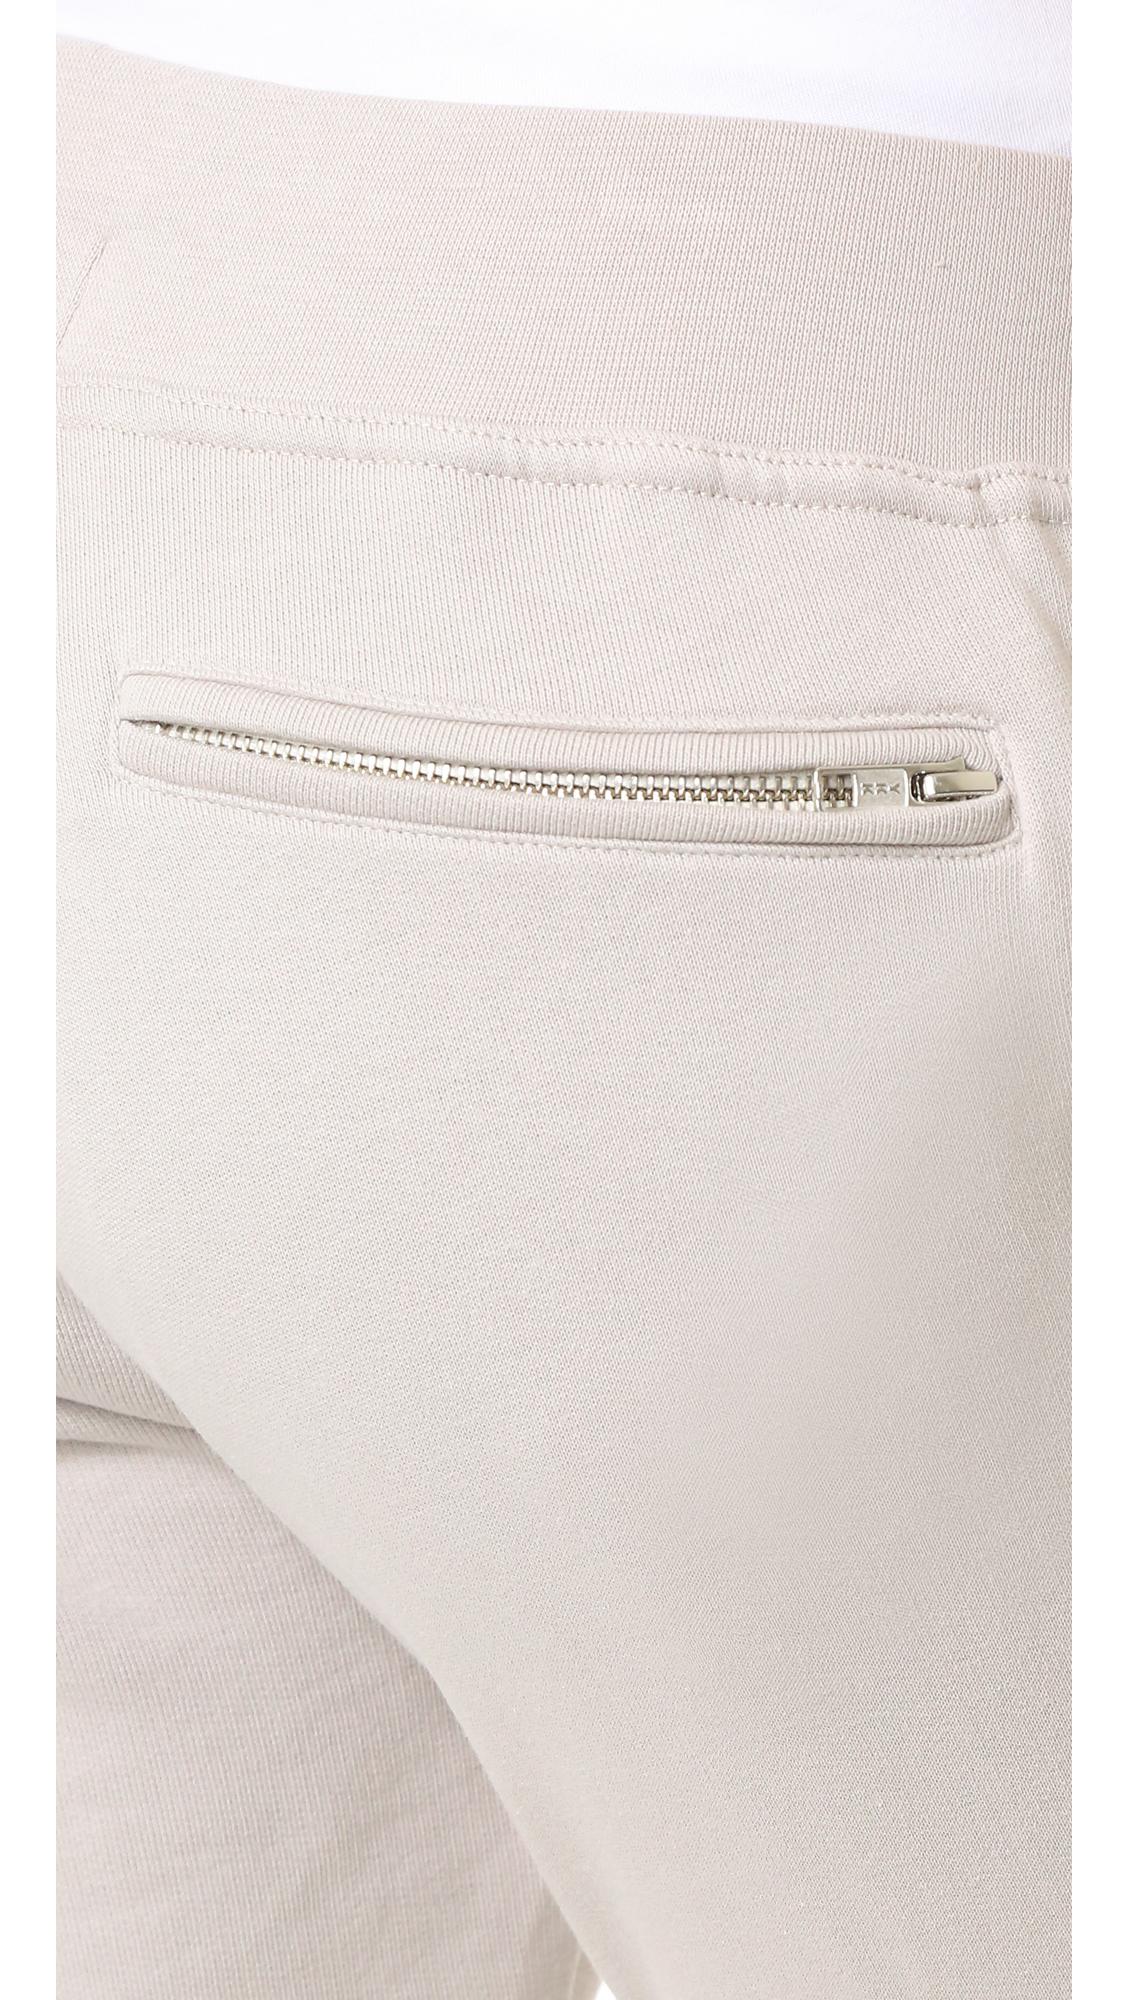 ff13a7240f83 Sincerely Jules Lux Sweatpants | SHOPBOP